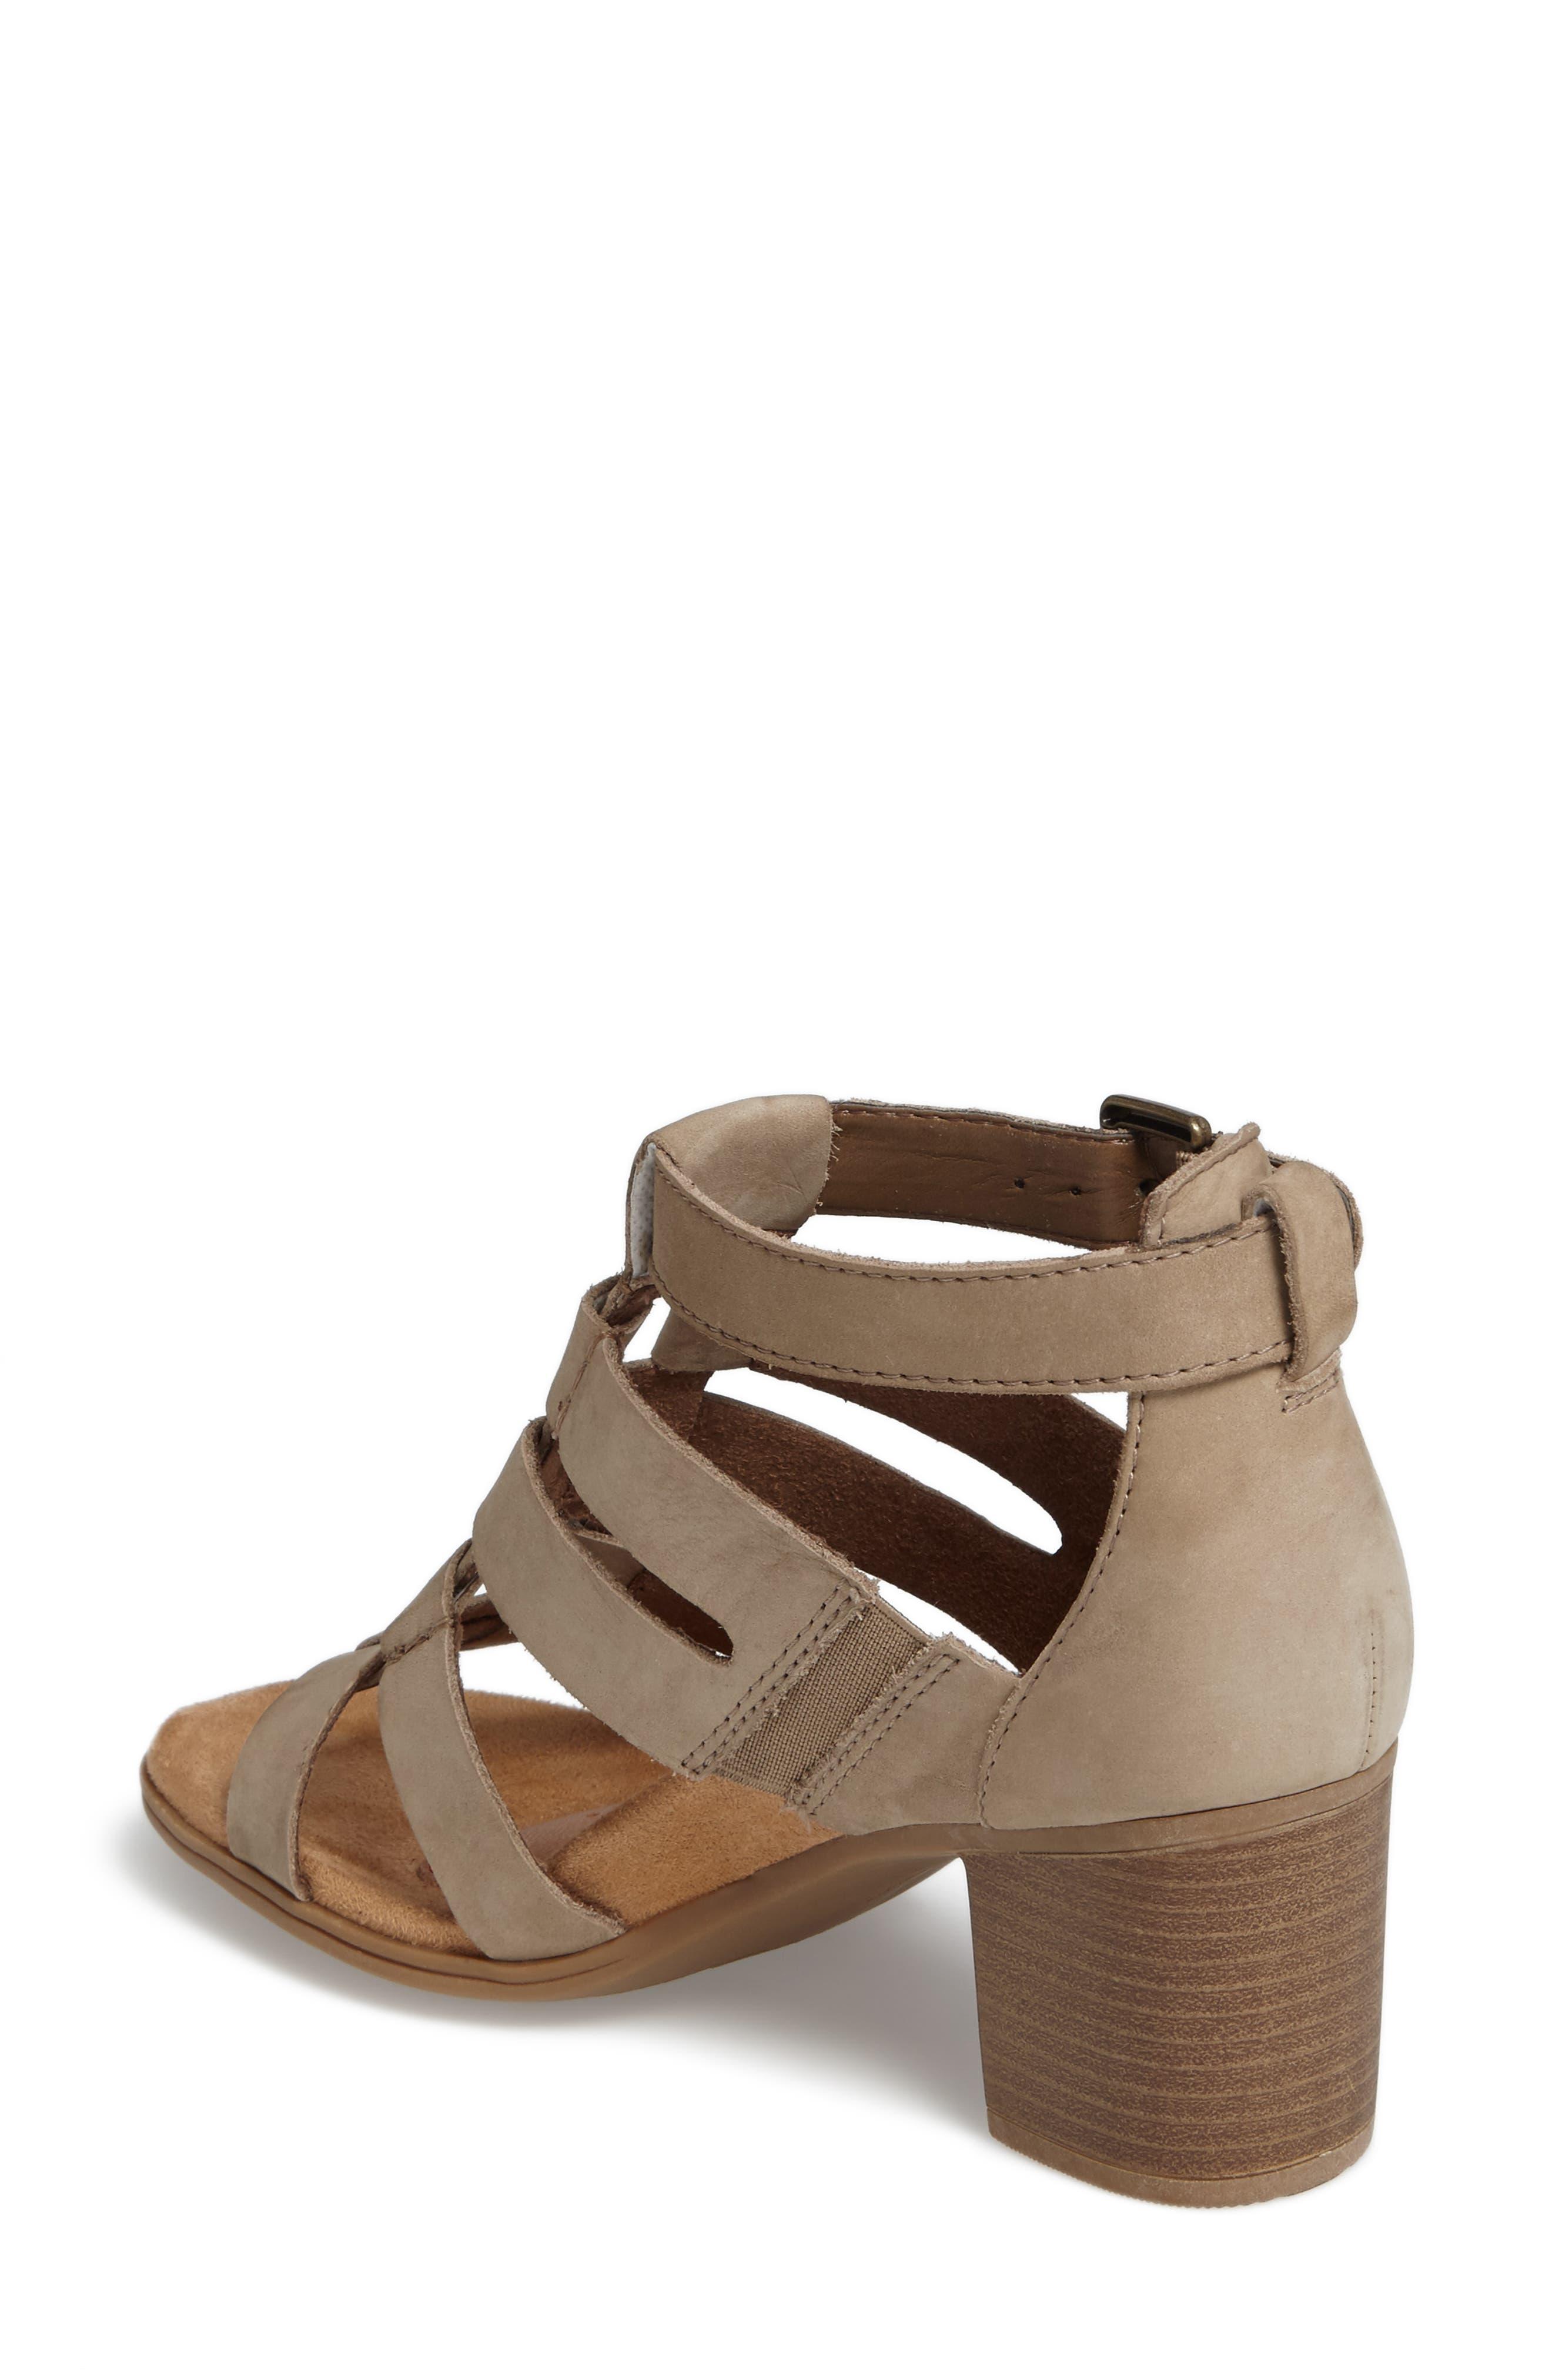 Alternate Image 2  - Rockport Cobb Hill Hattie Block Heel Gladiator Sandal (Women)